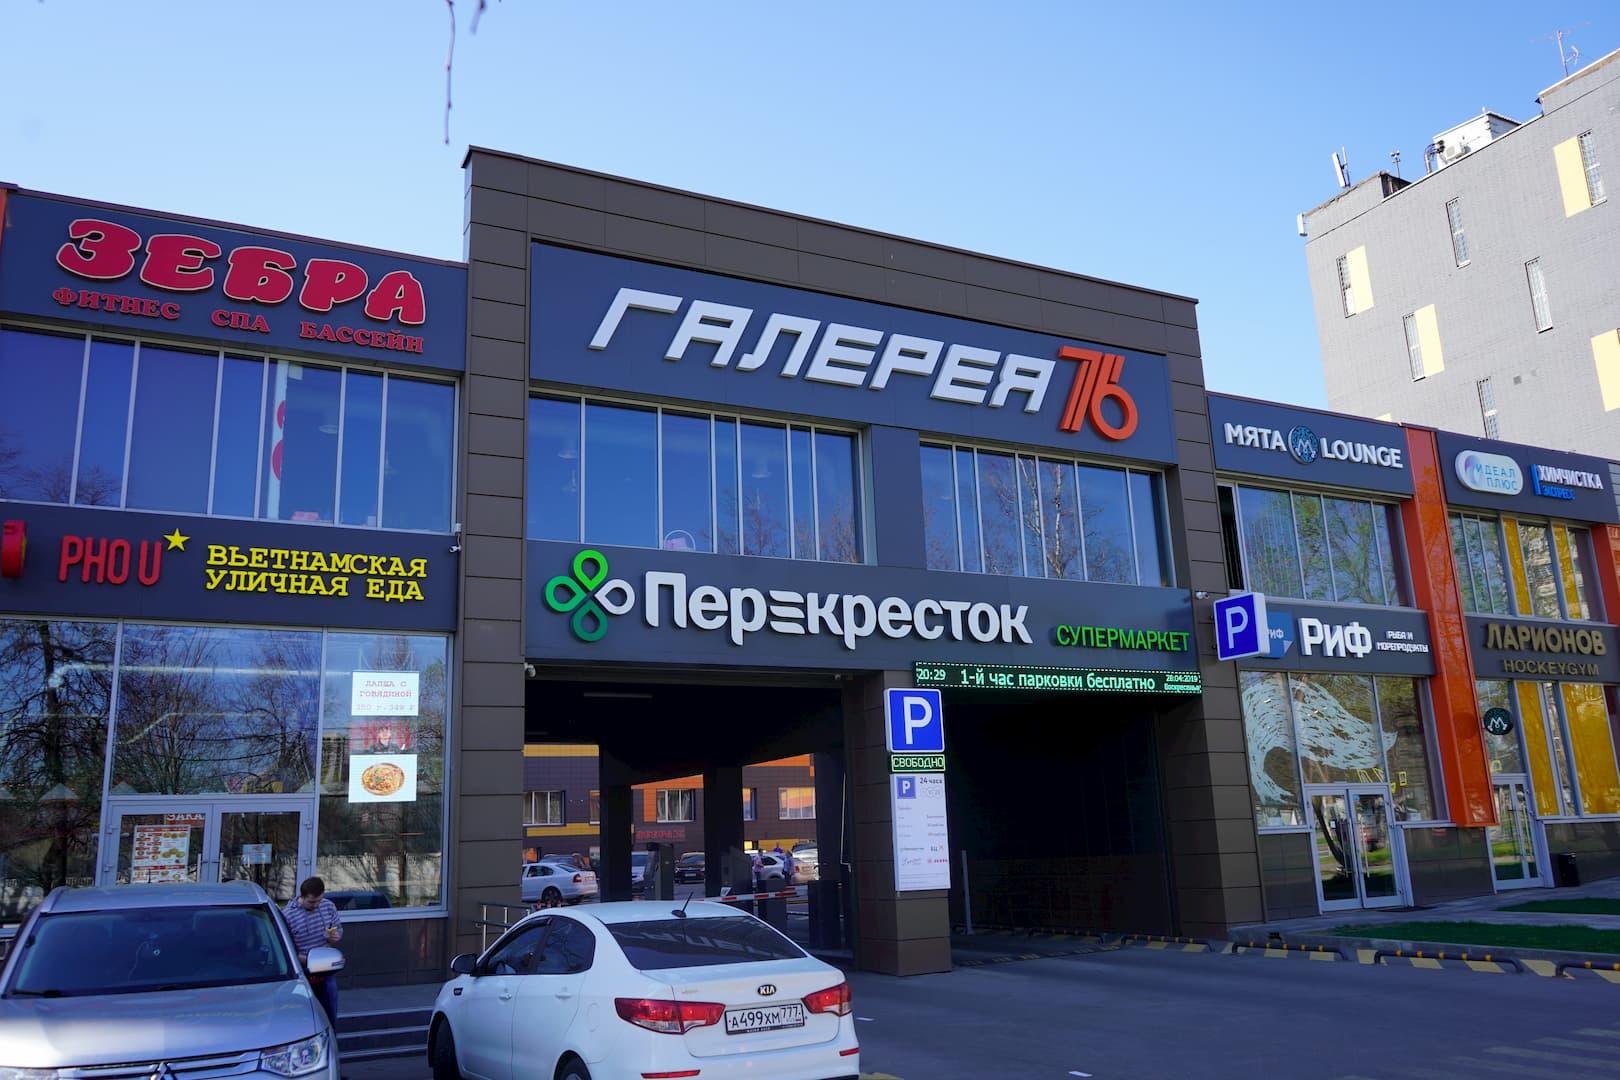 torgovo-ofisnyj-kompleks-galereja-76 (20)